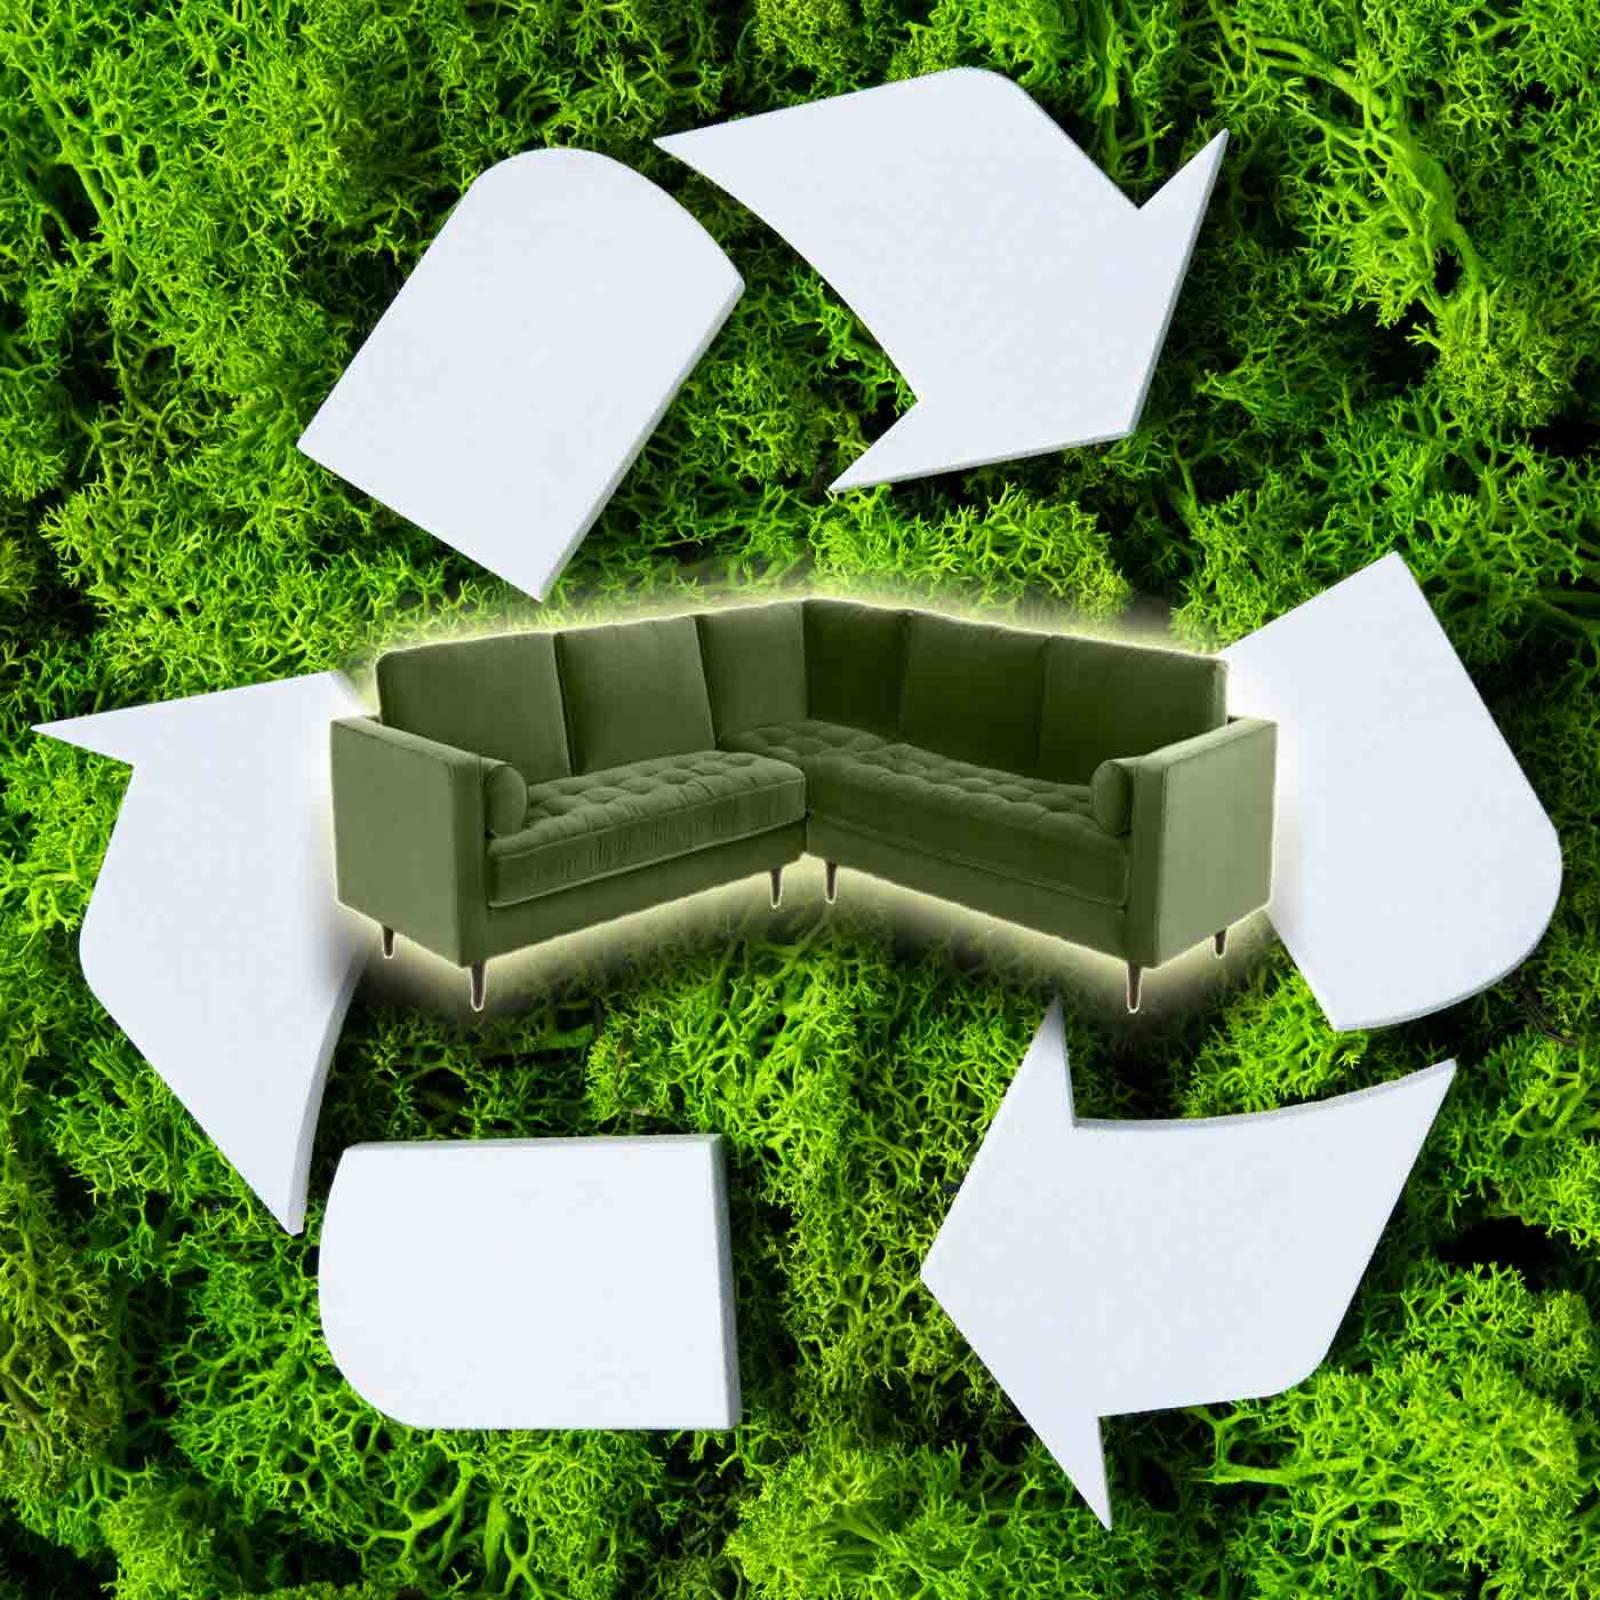 Corner Sofa - Furniture Disposal & Recycling